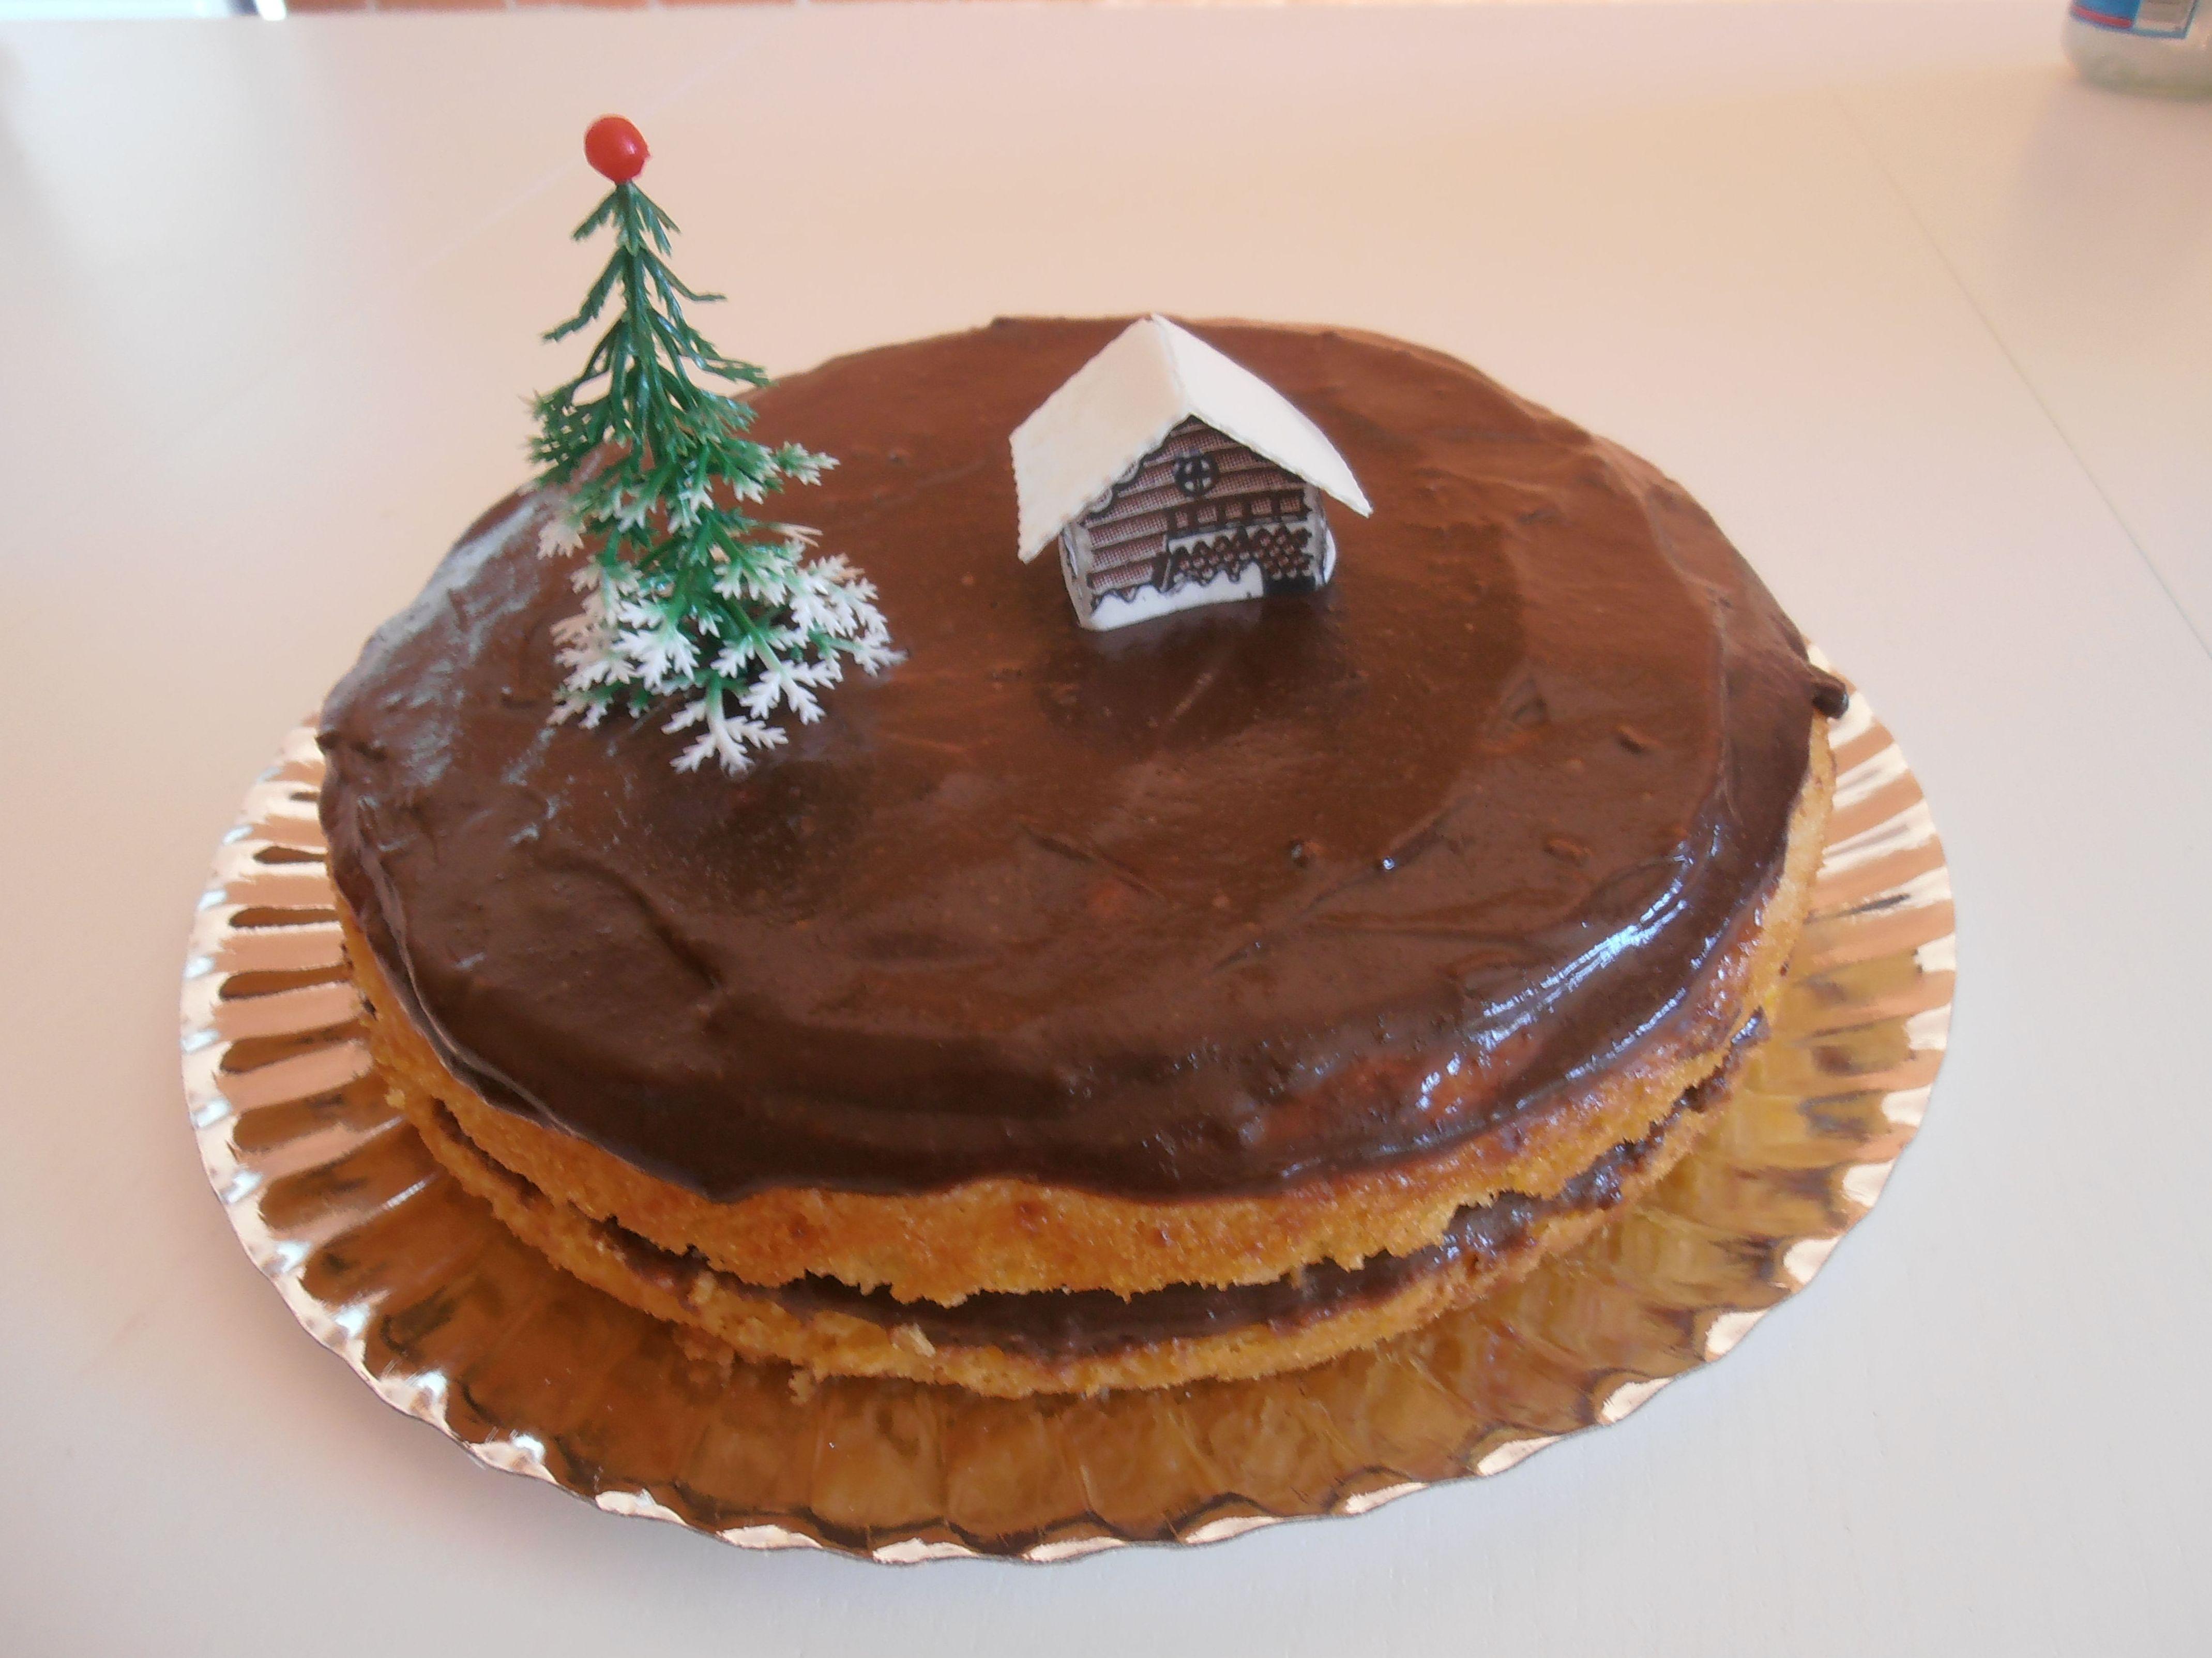 Una tarta de Navidad